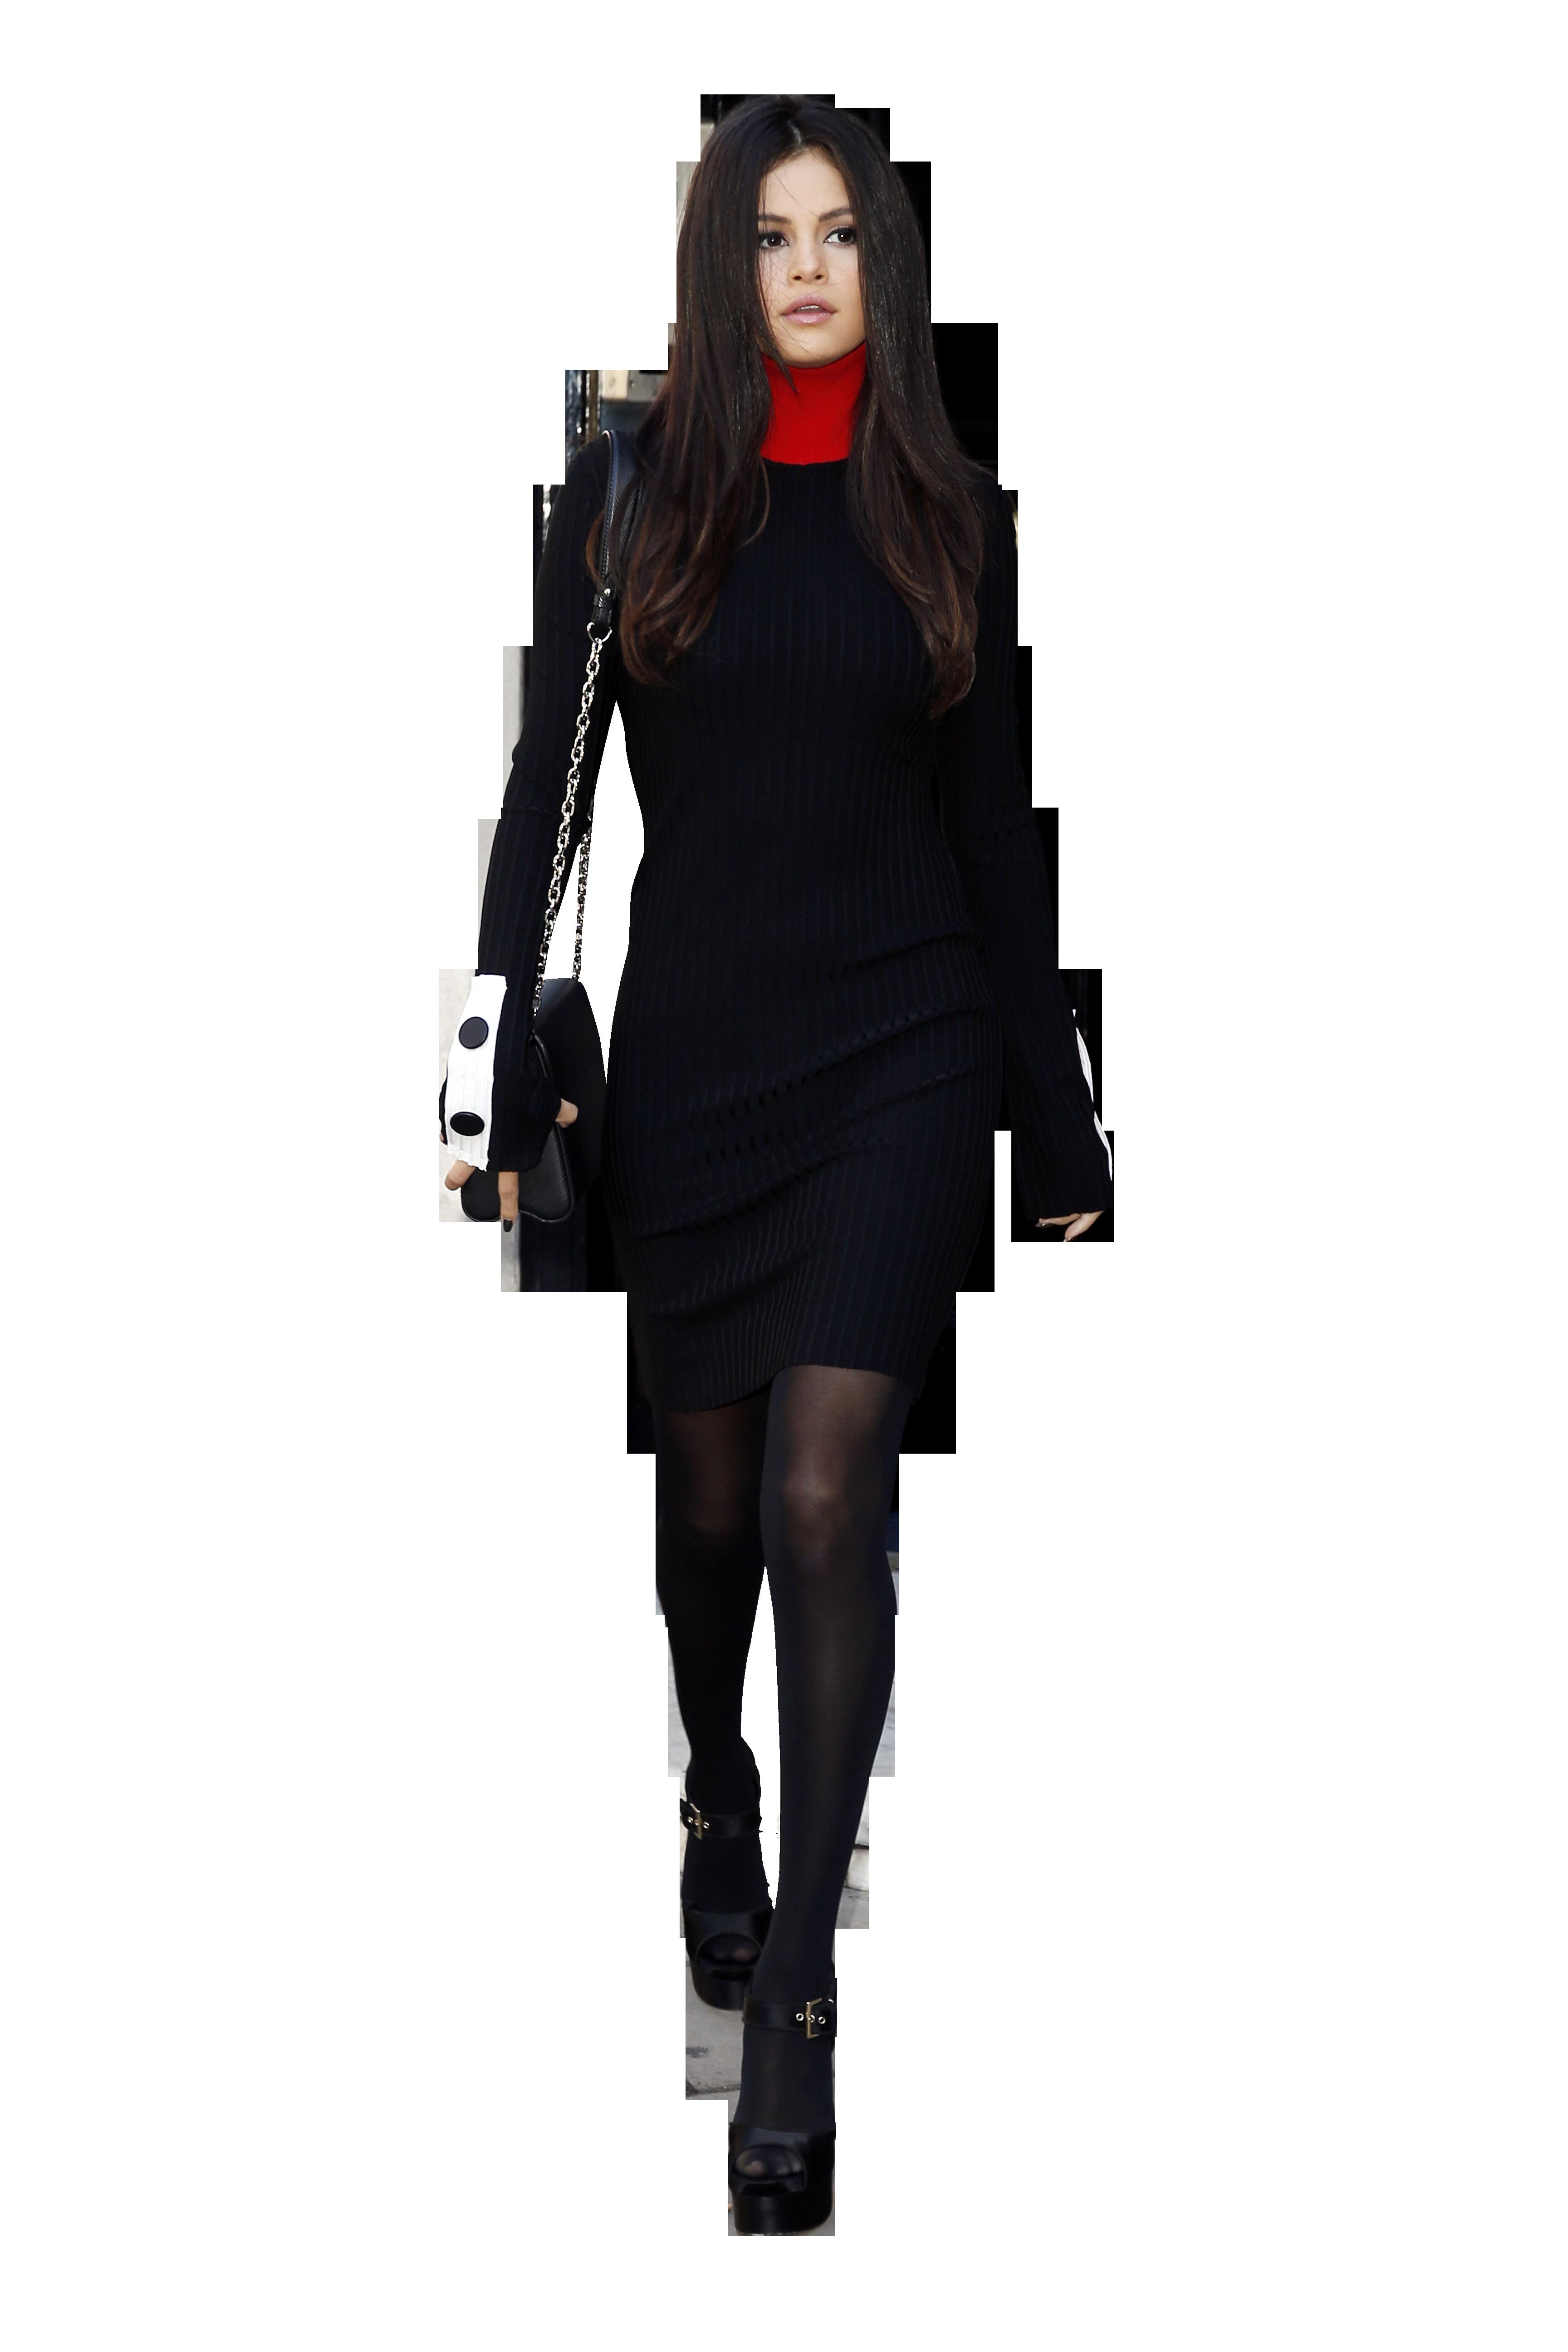 Selena Gomez Walking in Black PNG Image